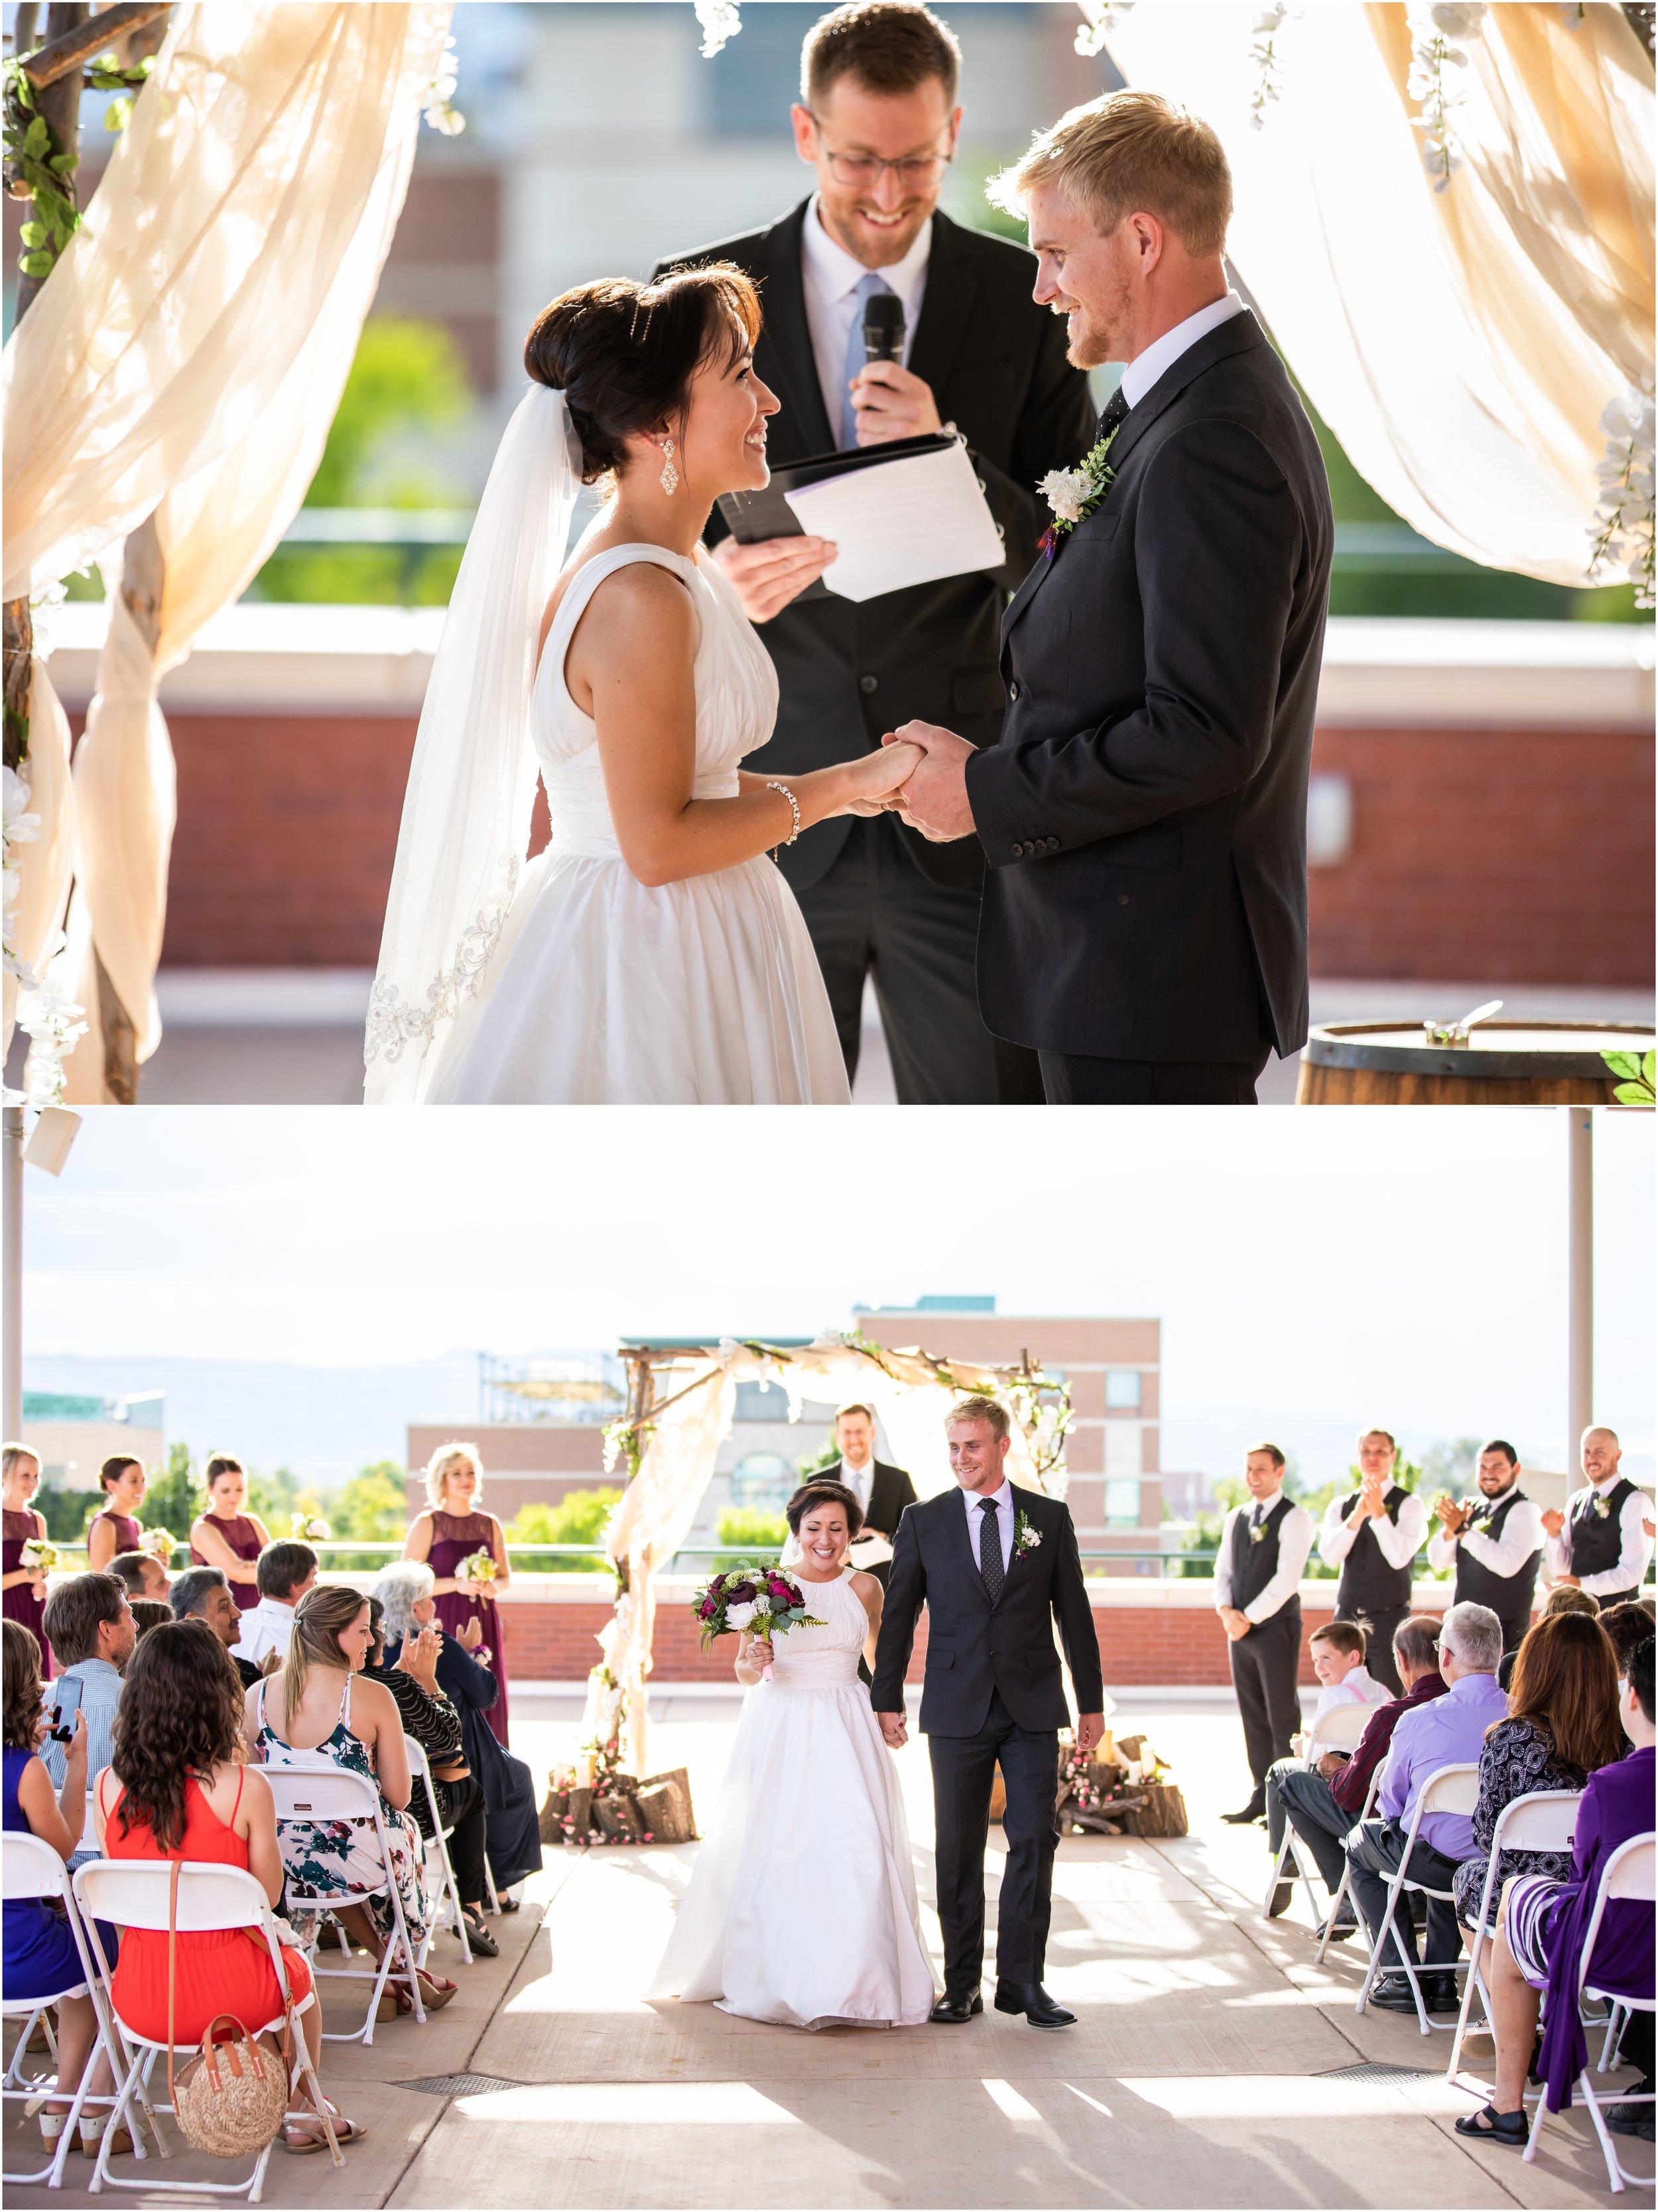 grand junction wedding photographer 25.jpg